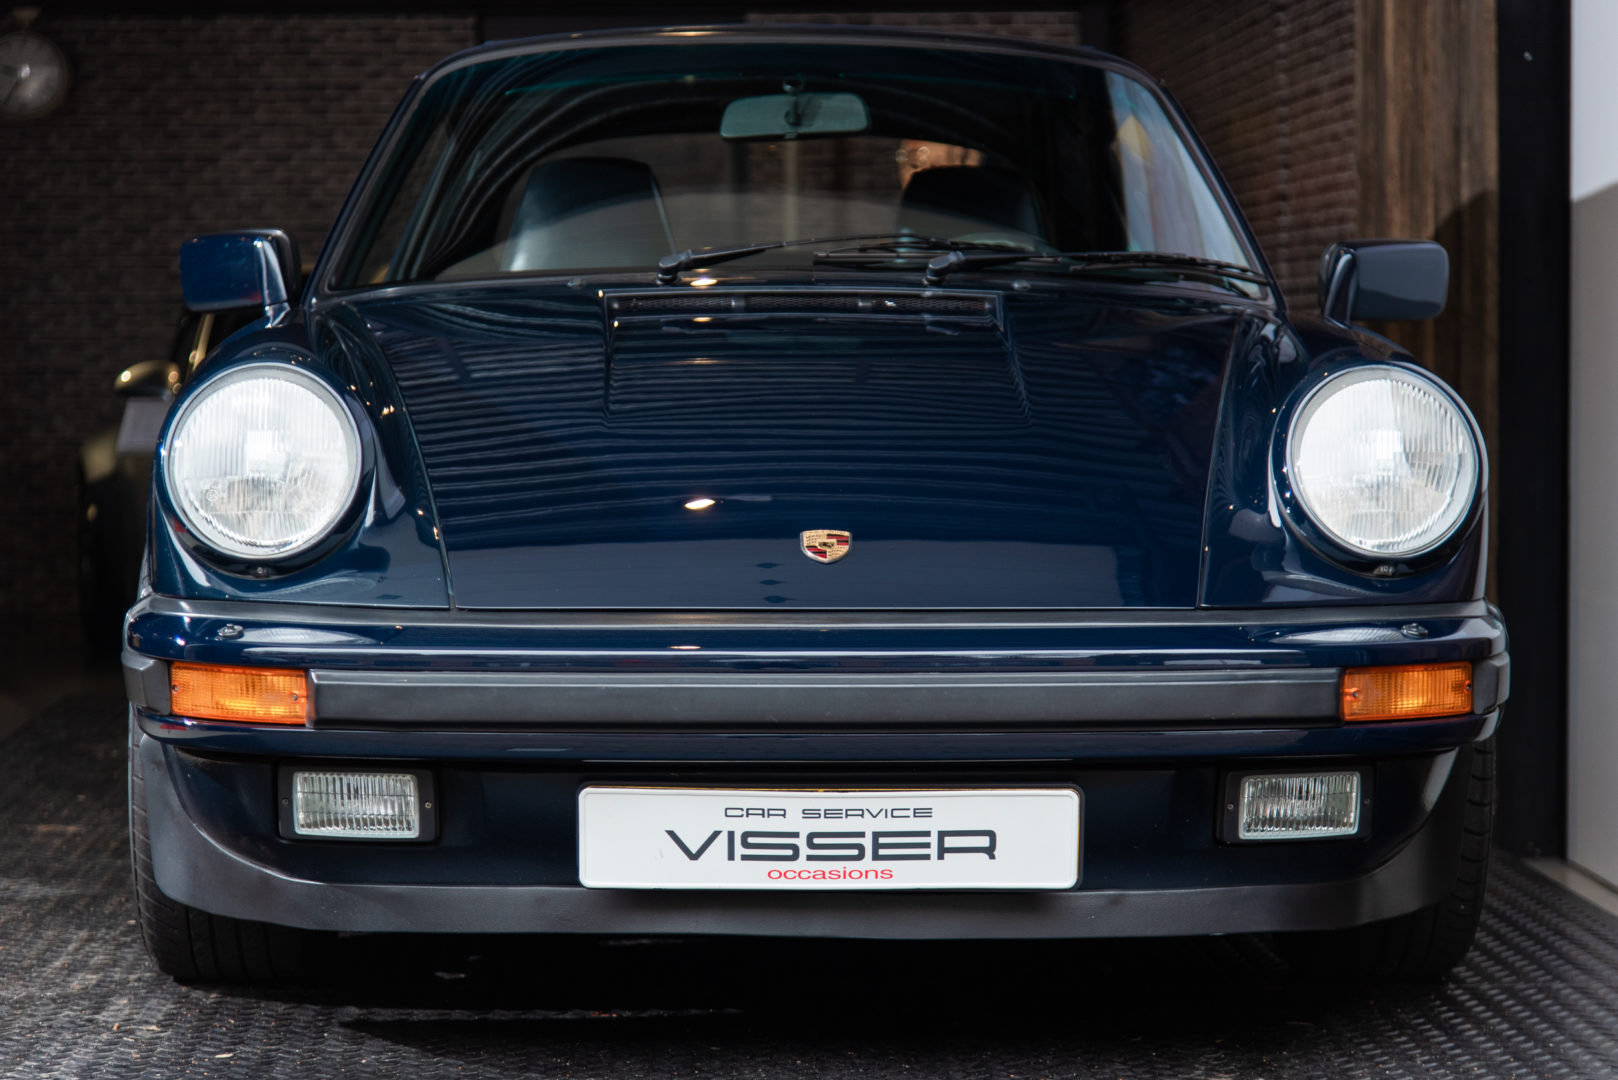 Porsche 911 3.2 G50 handgeschakelde cabriolet Dunkelblau